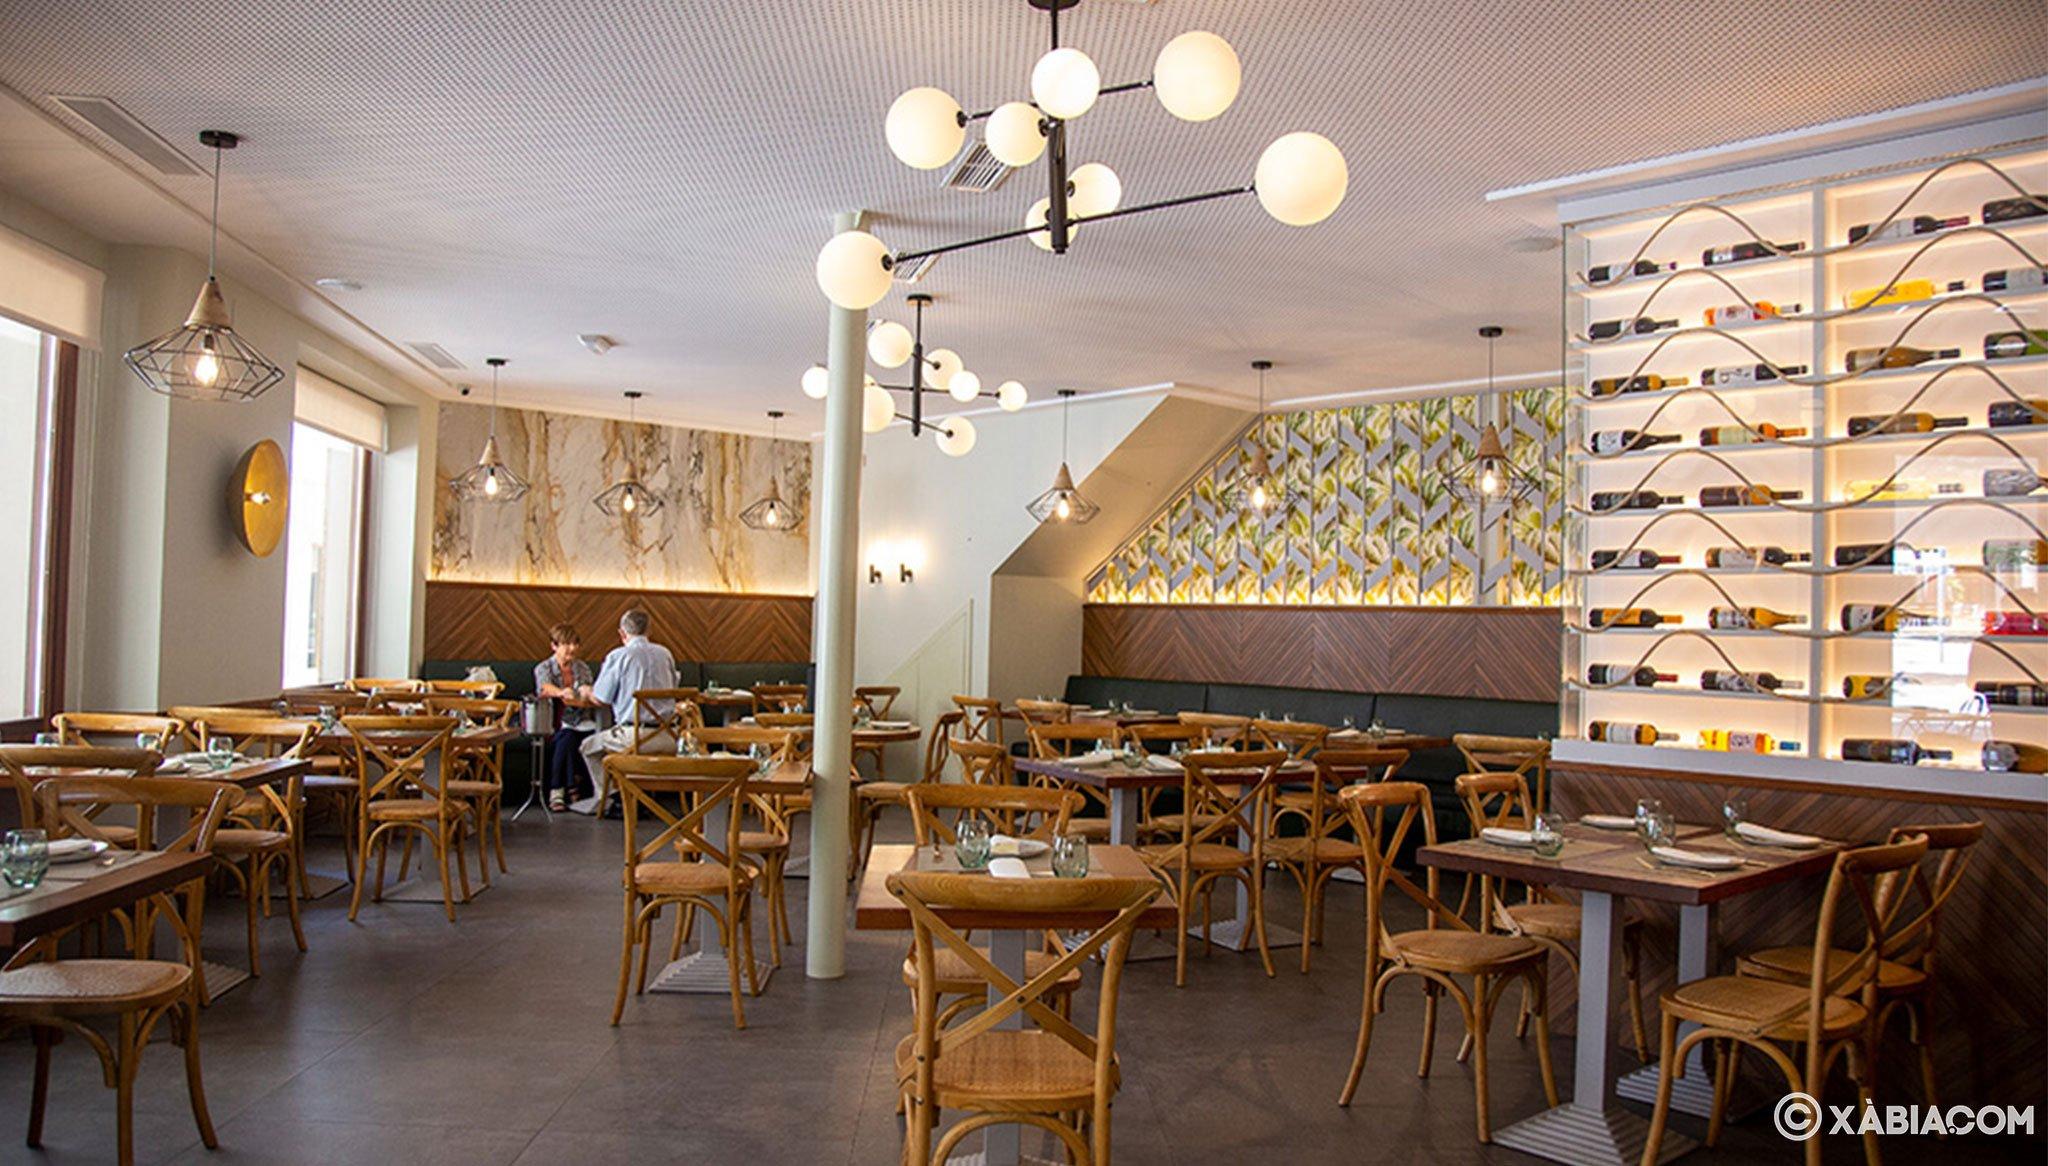 Comedor acogedor y moderno en Restaurante Da Giulia